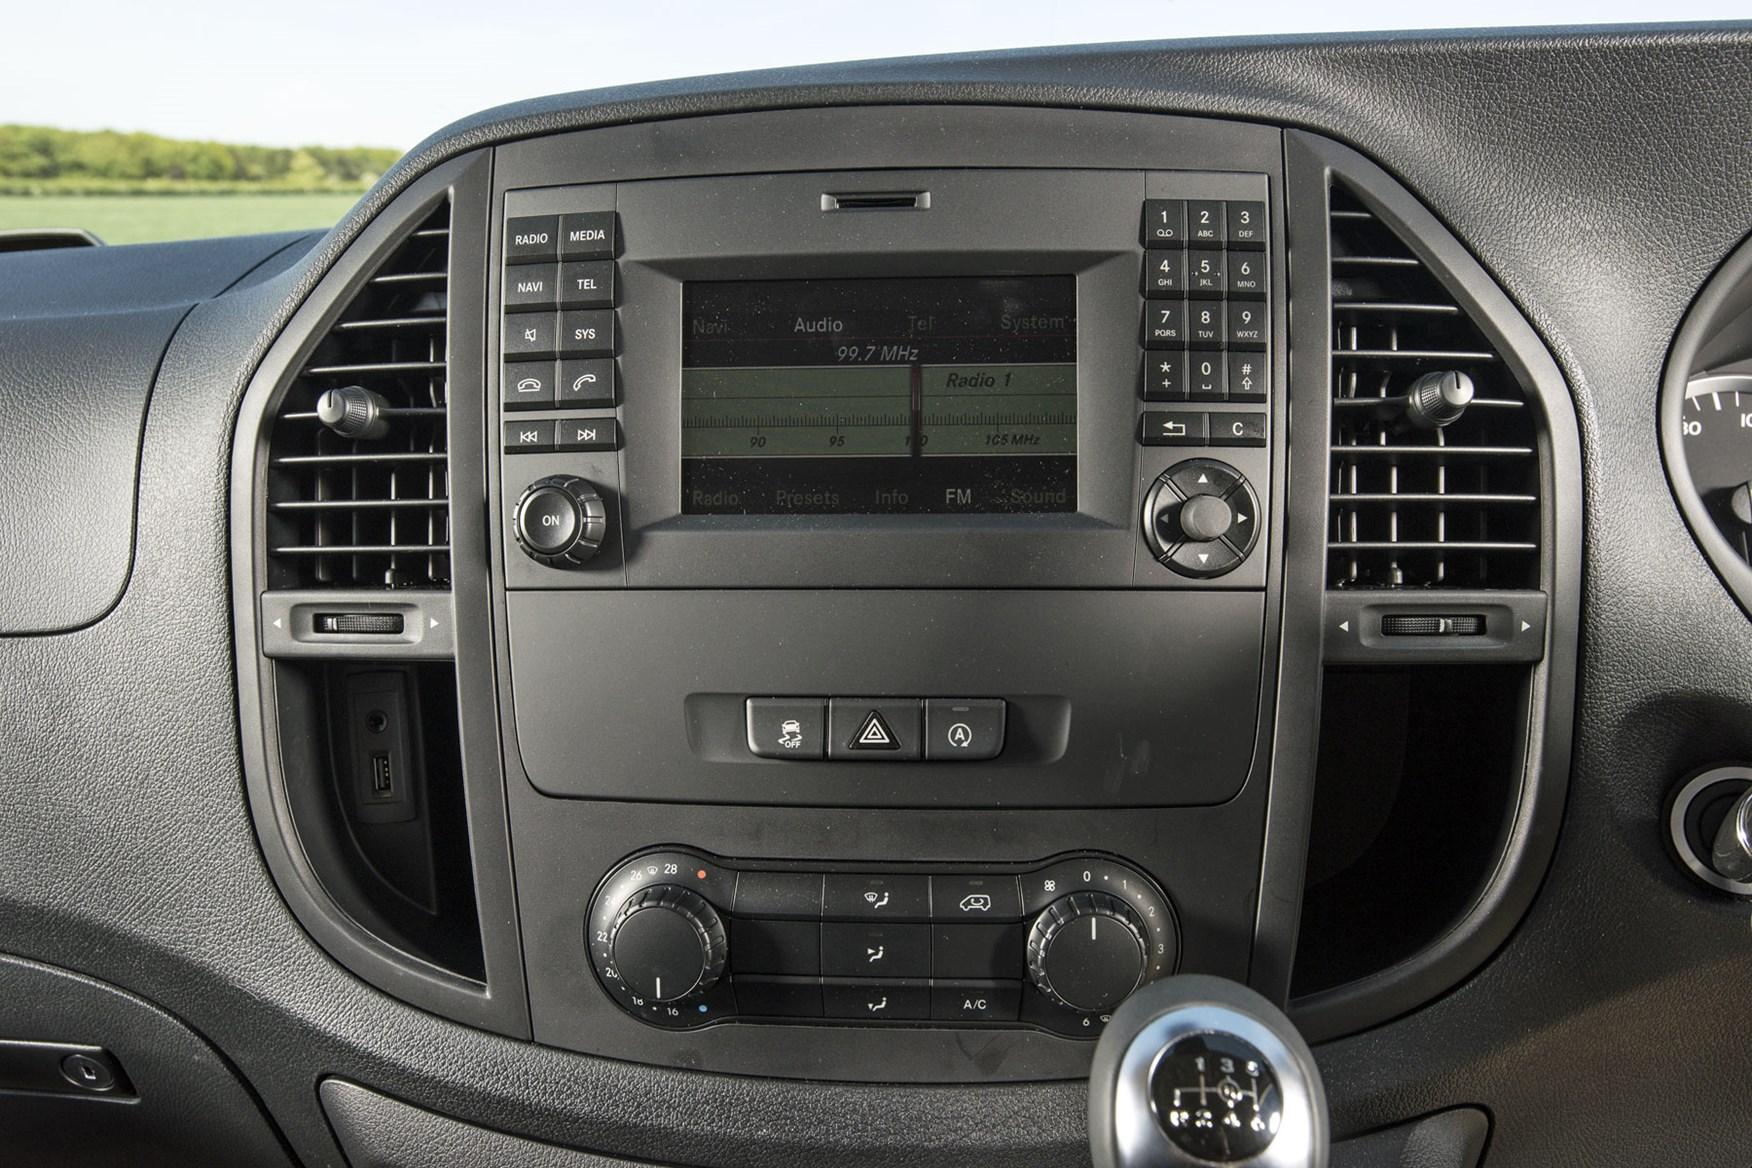 Mercedes Vito Premium review - Audio 15 infotainment system